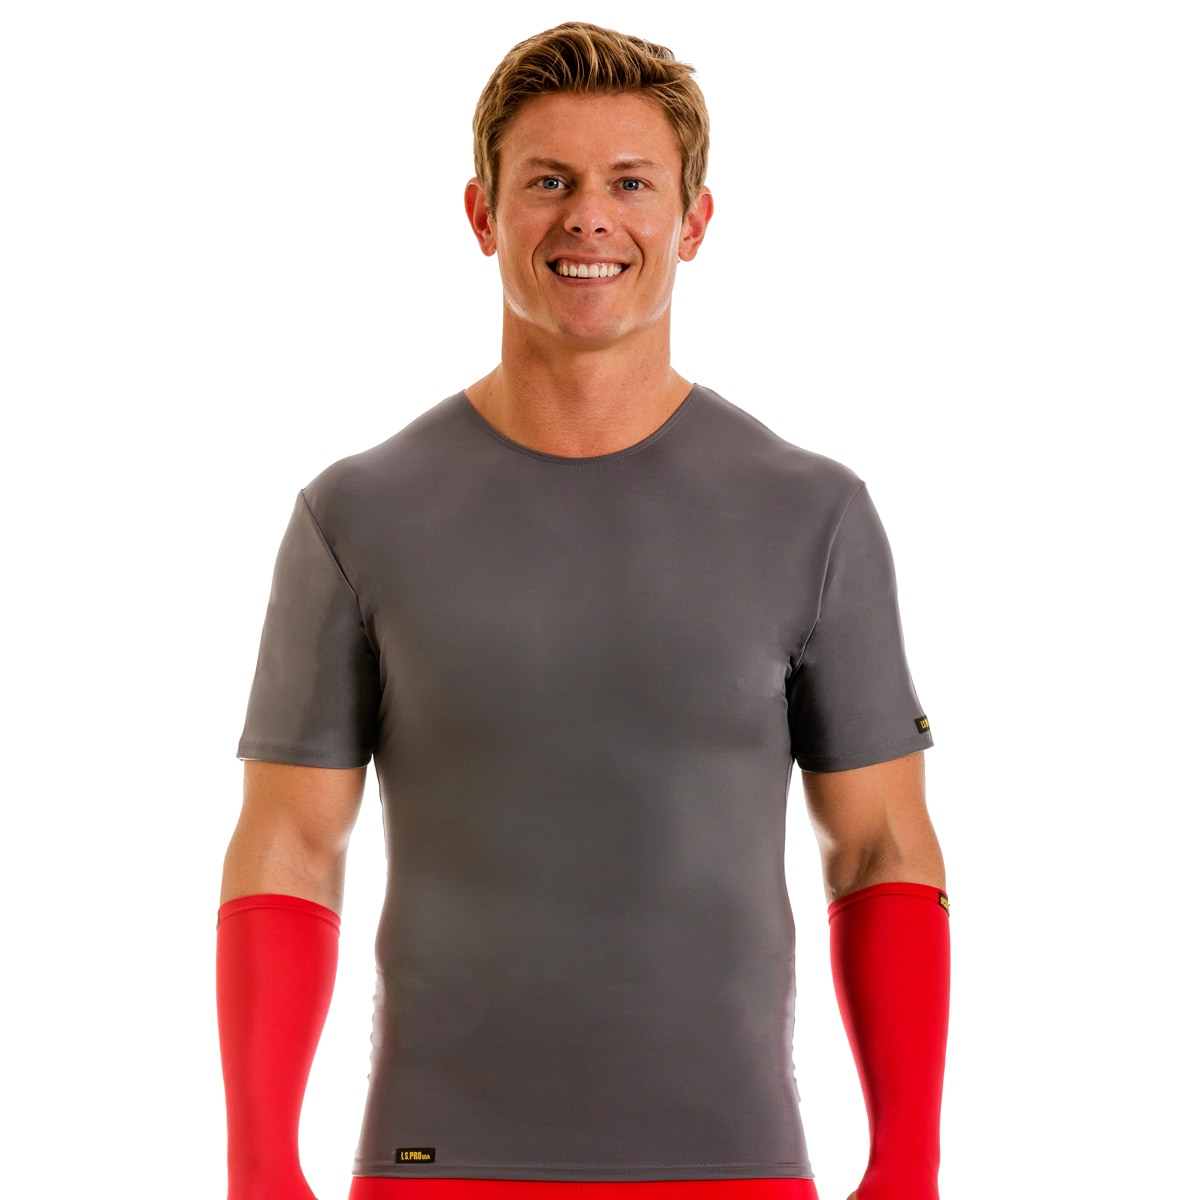 Insta Slim Men's Pro Active Wear Compression Crew-neck T-...